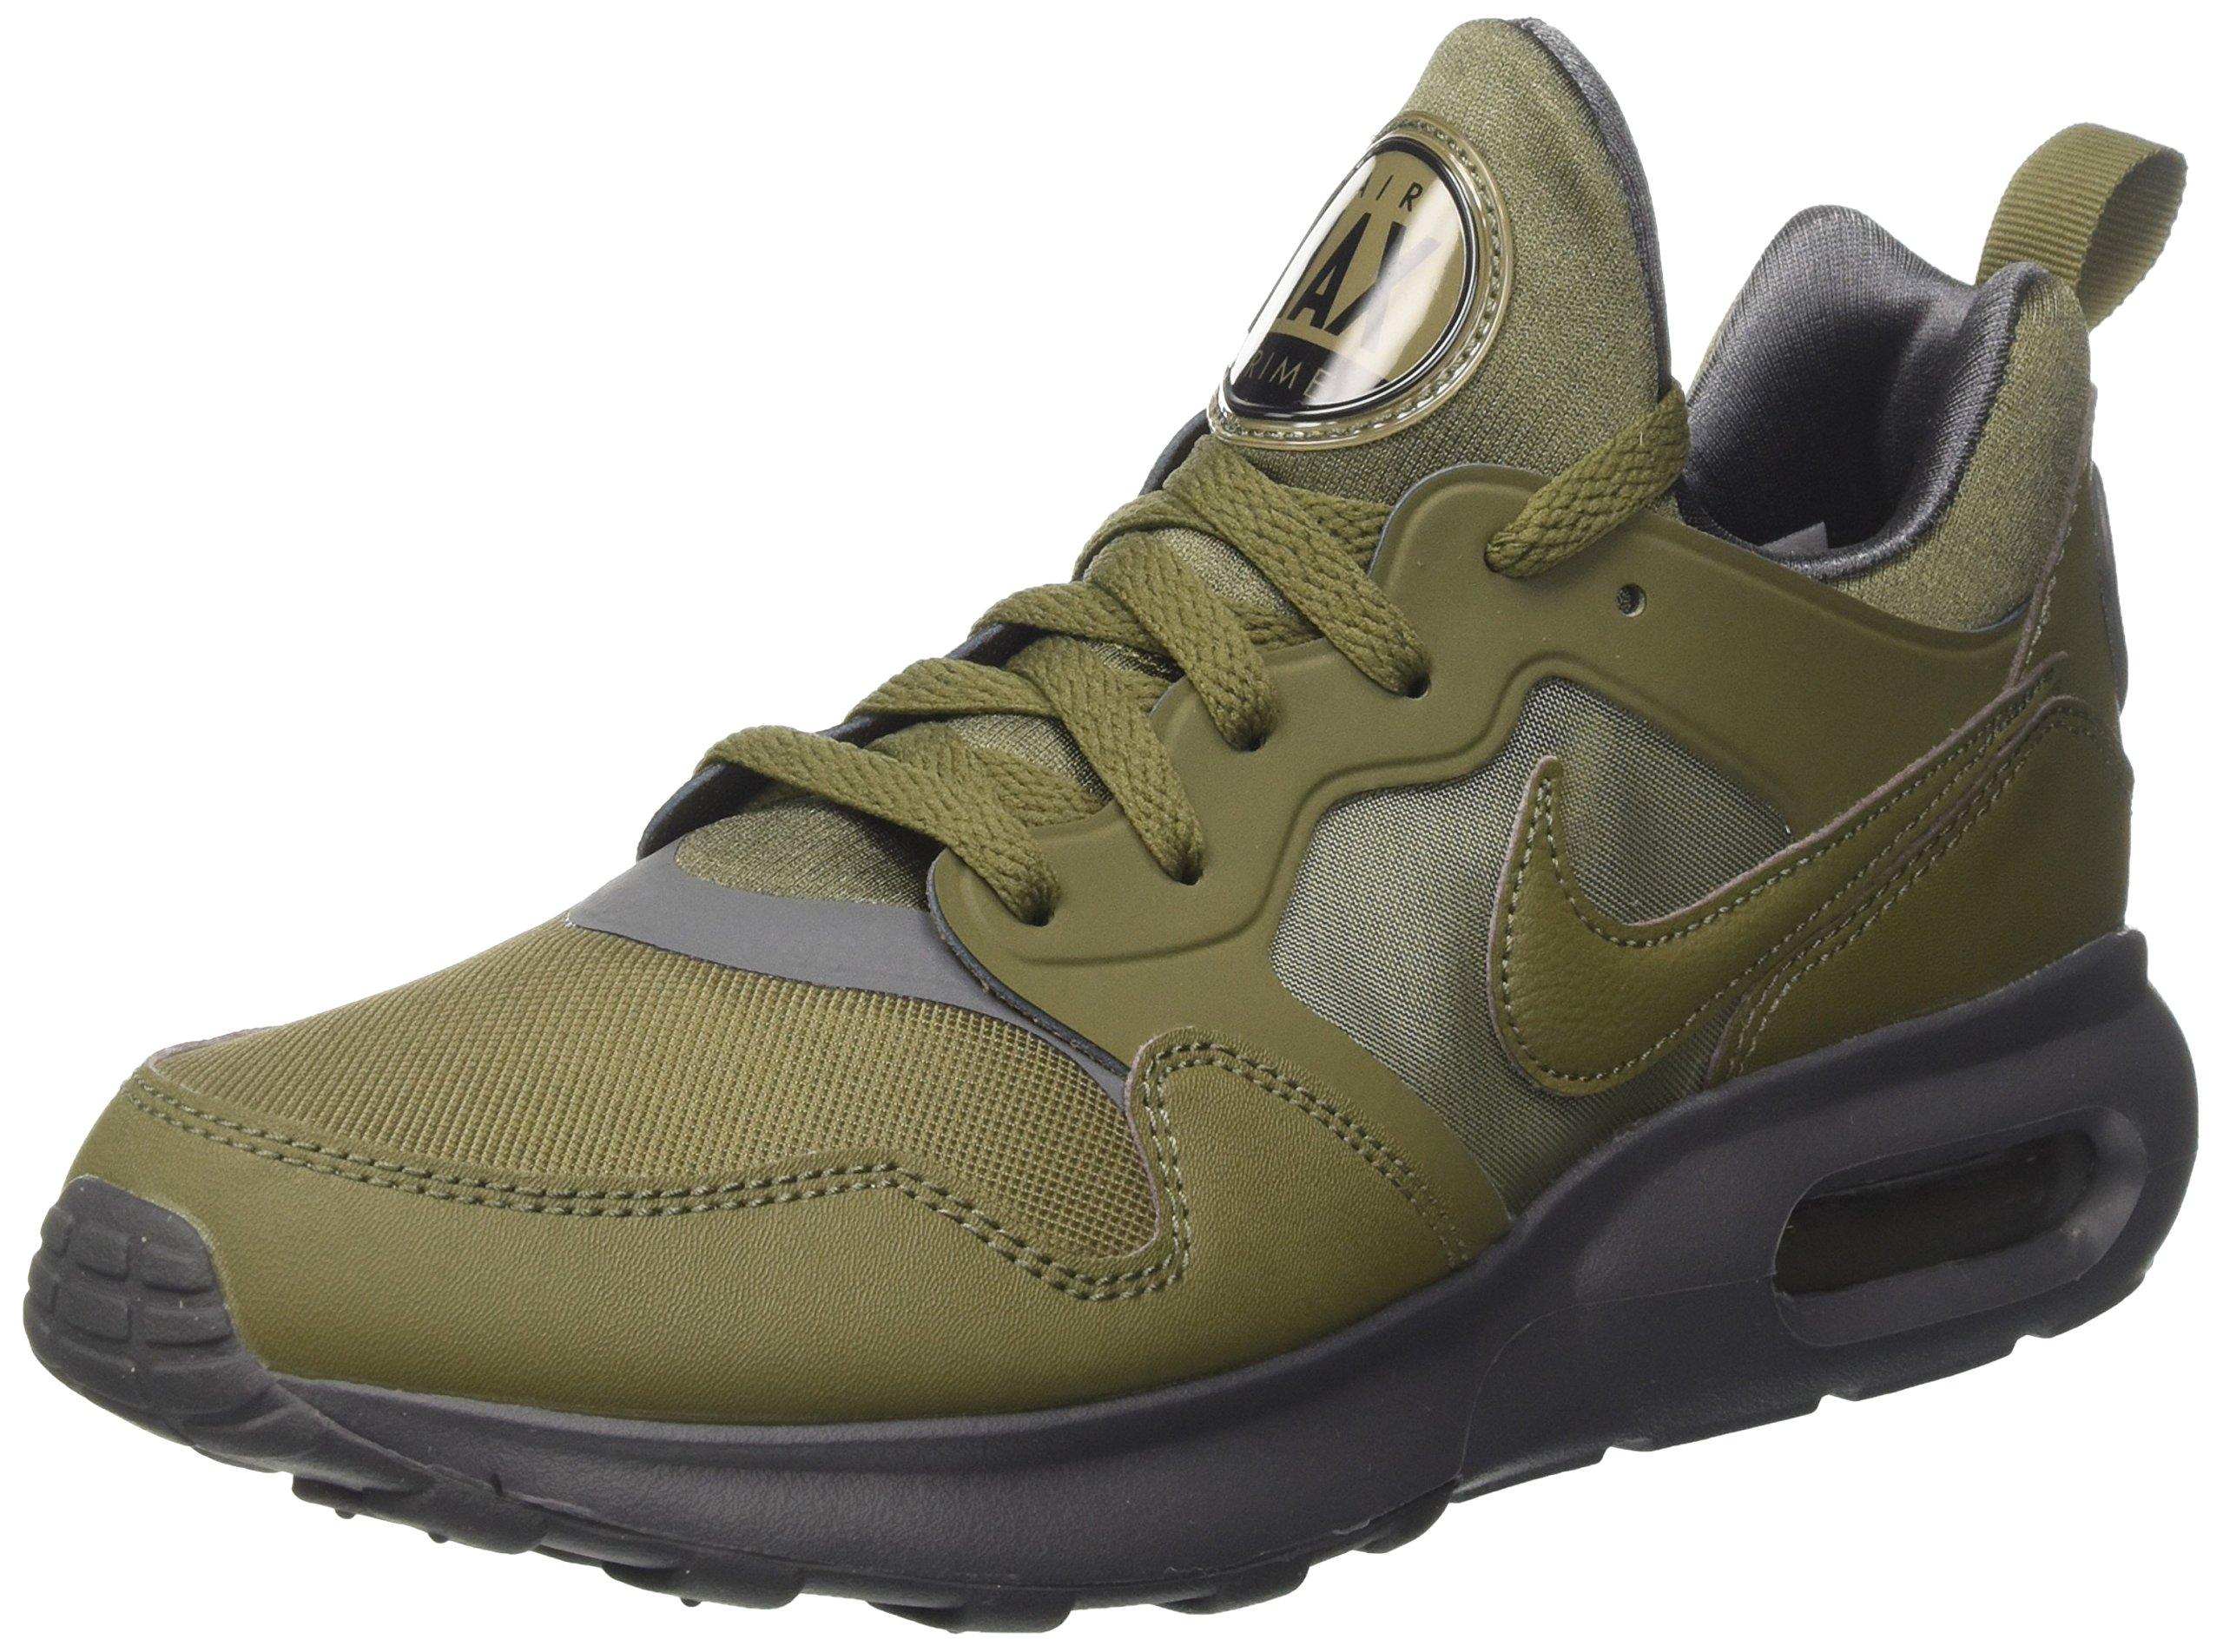 Nike Air Max Prime Mens Running Trainers 876068 Sneakers Shoes (UK 7 US 8 EU 41, Medium Olive 200)